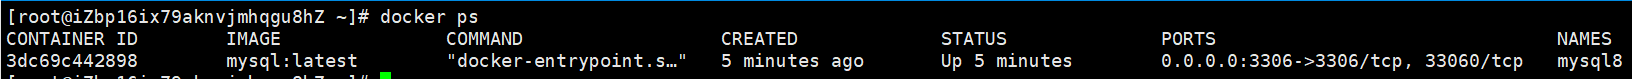 Docker 搭建 lnmp 环境